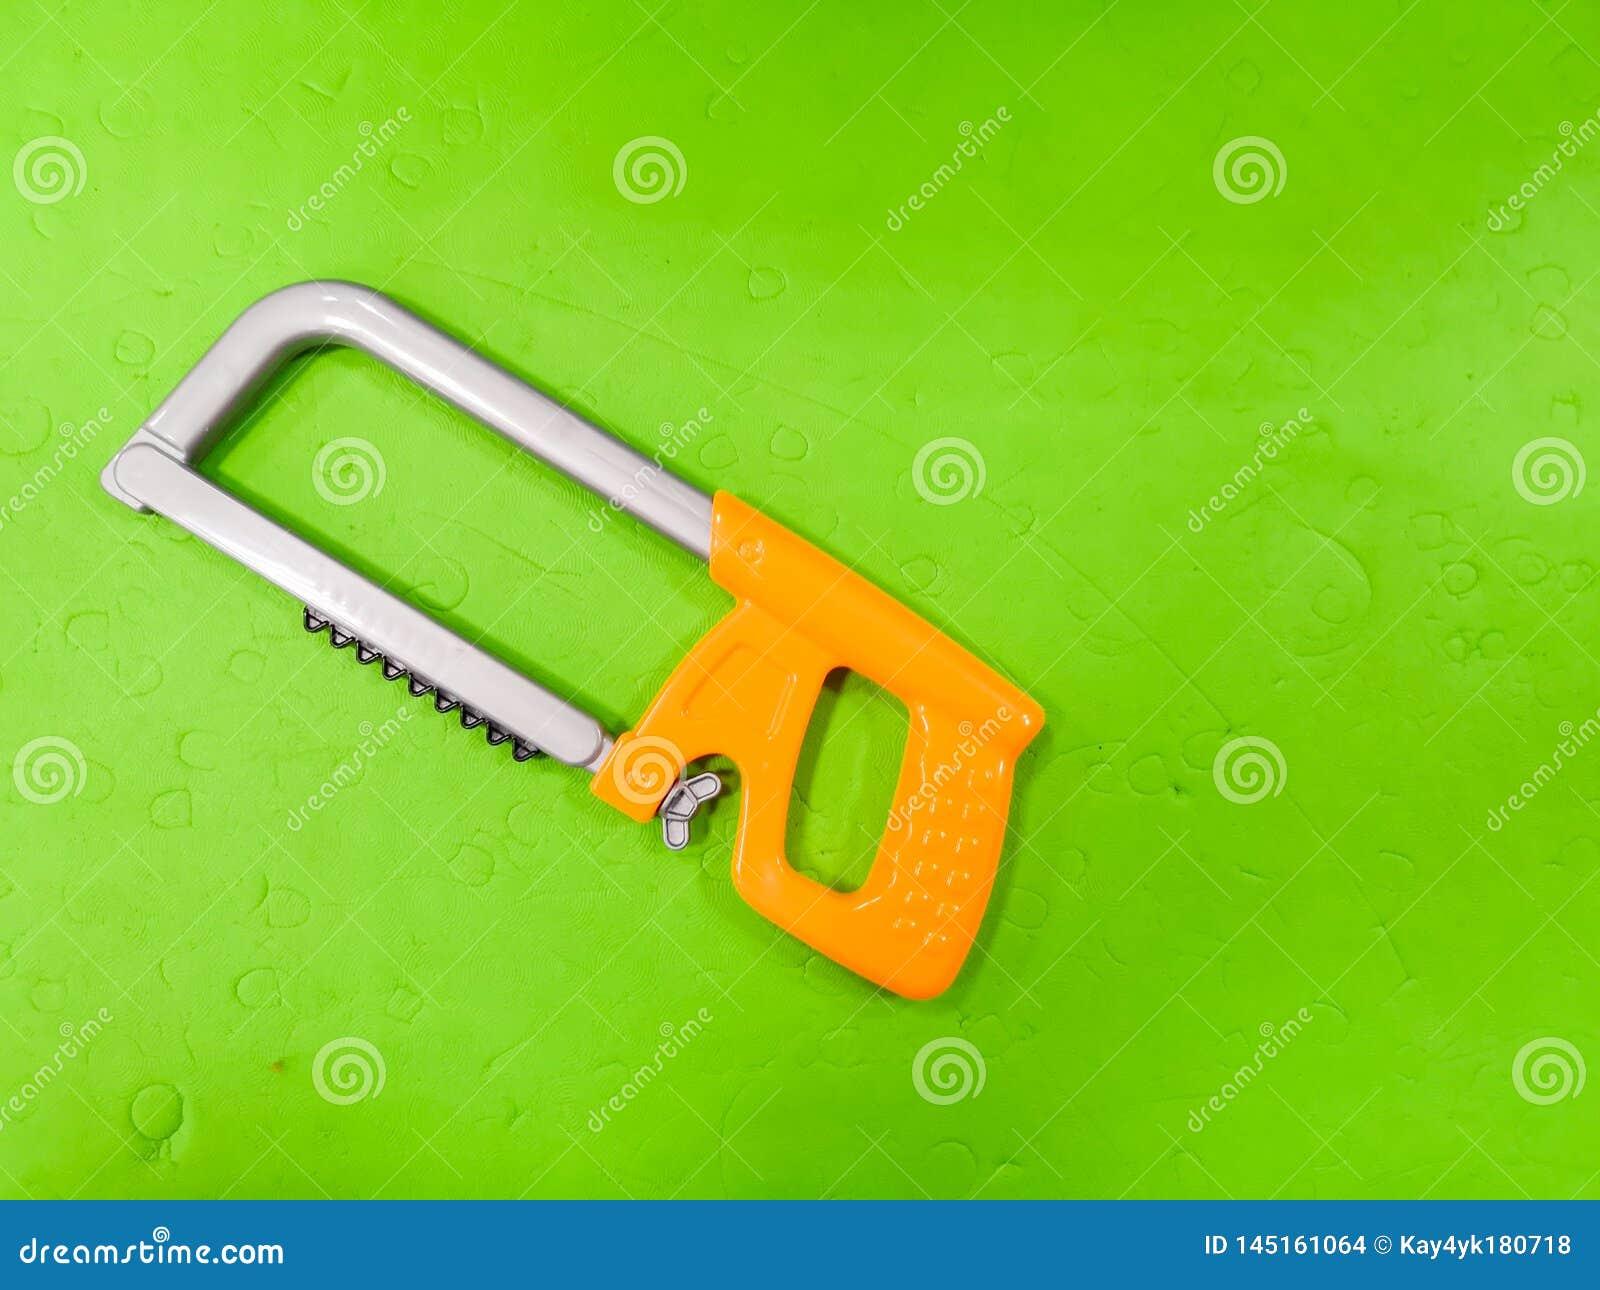 Children`s bait, on a green background. Tool for the child, repairman detsky, development for children, preparing the child for